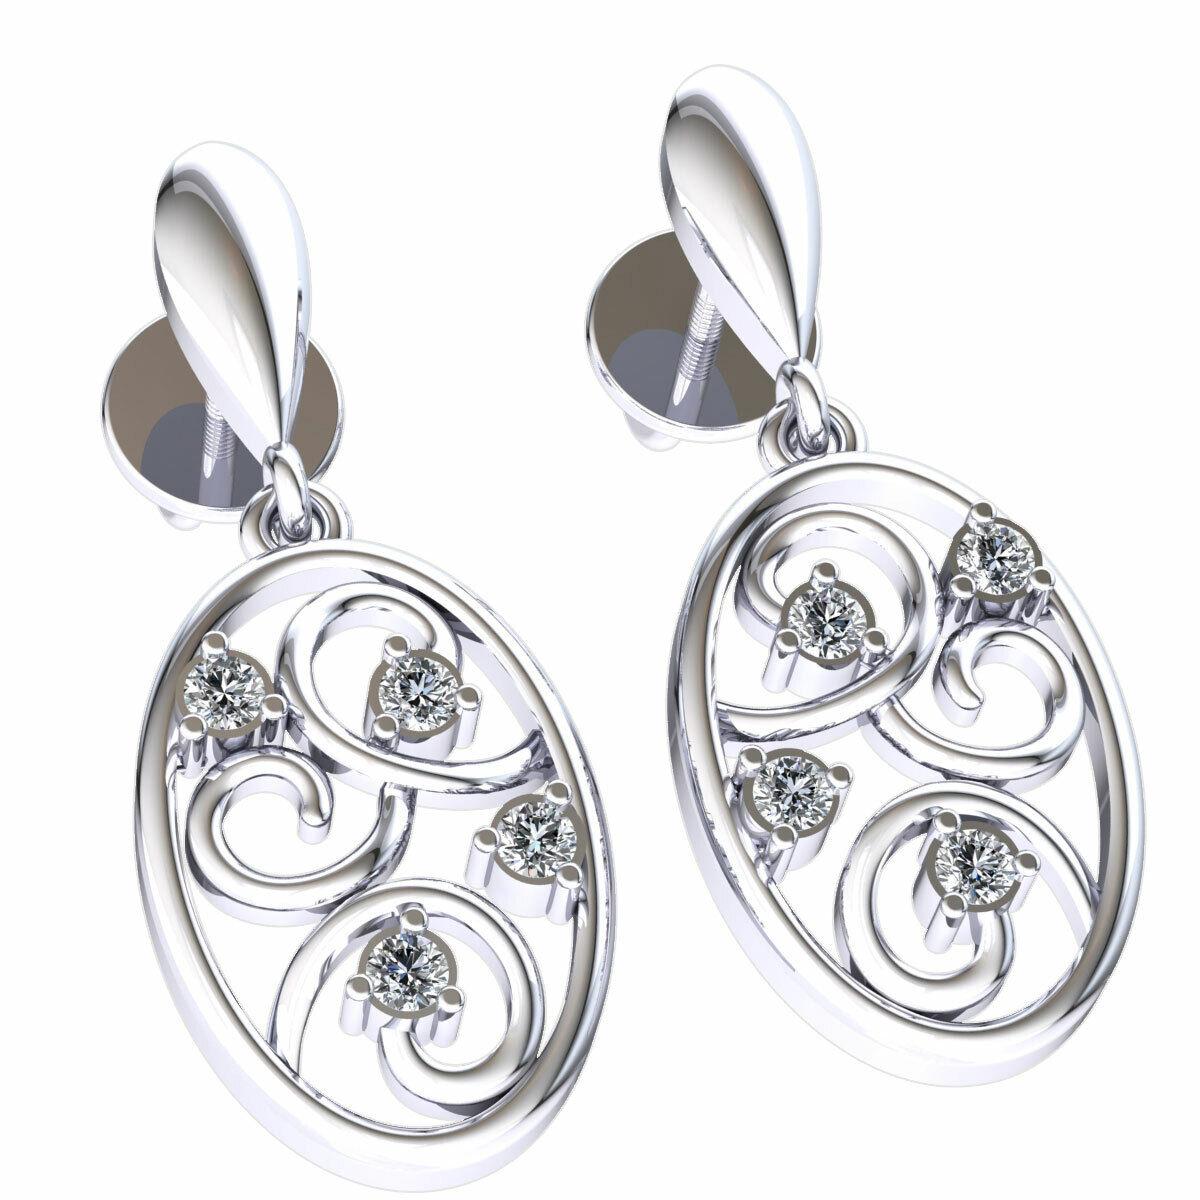 0.1ctw Genuine Round Cut Diamond Ladies Oval Drop Earrings Solid 14K gold